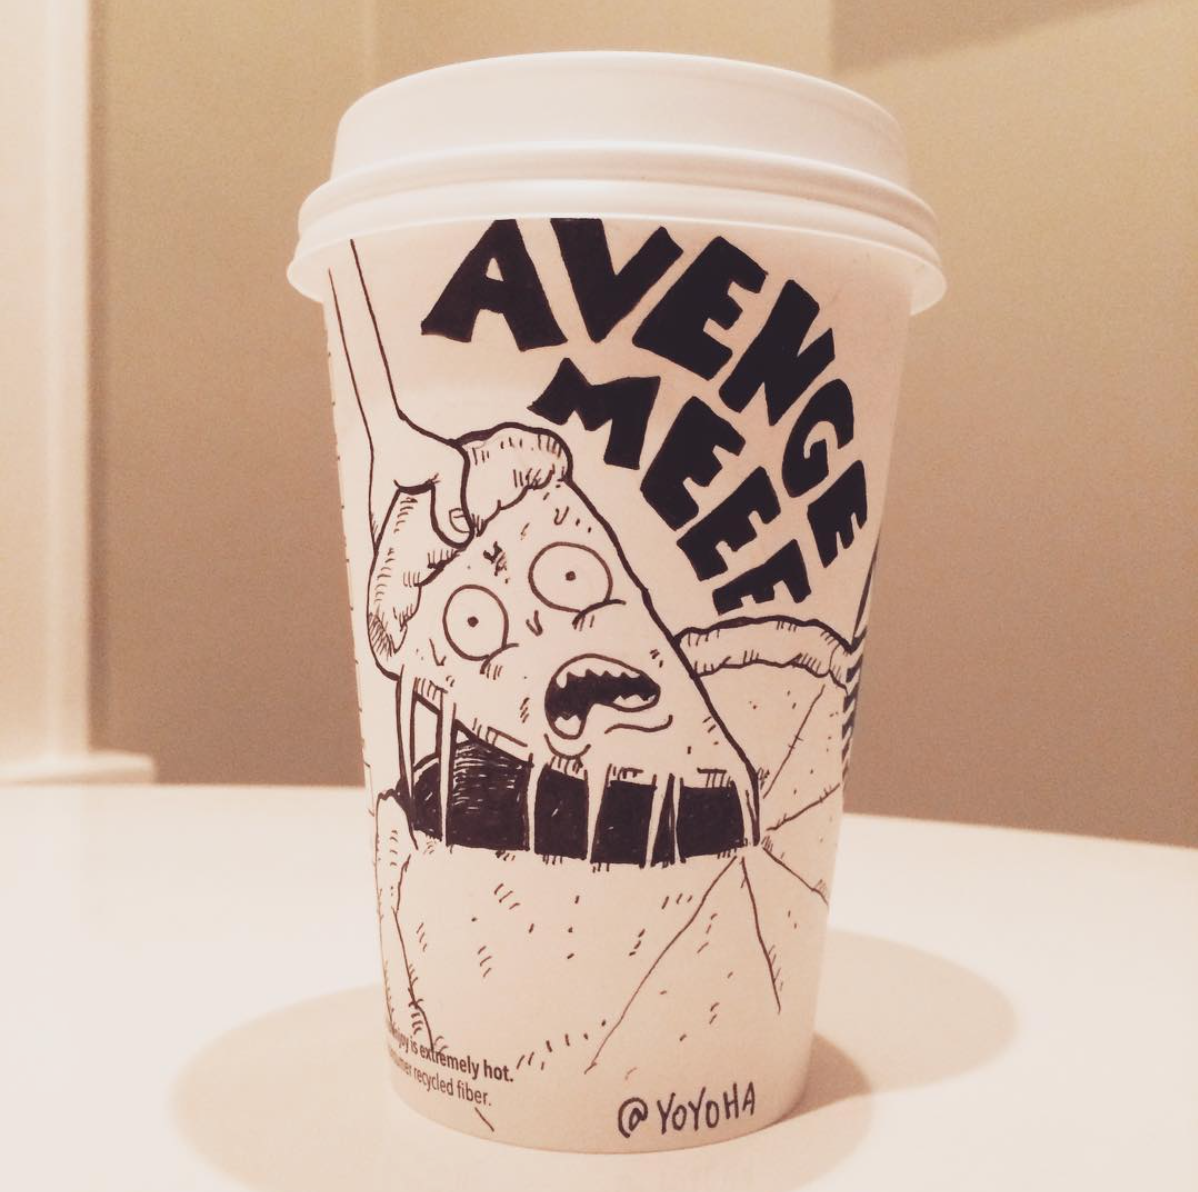 Yoyoha, les cartoons sur les gobelets Starbucks